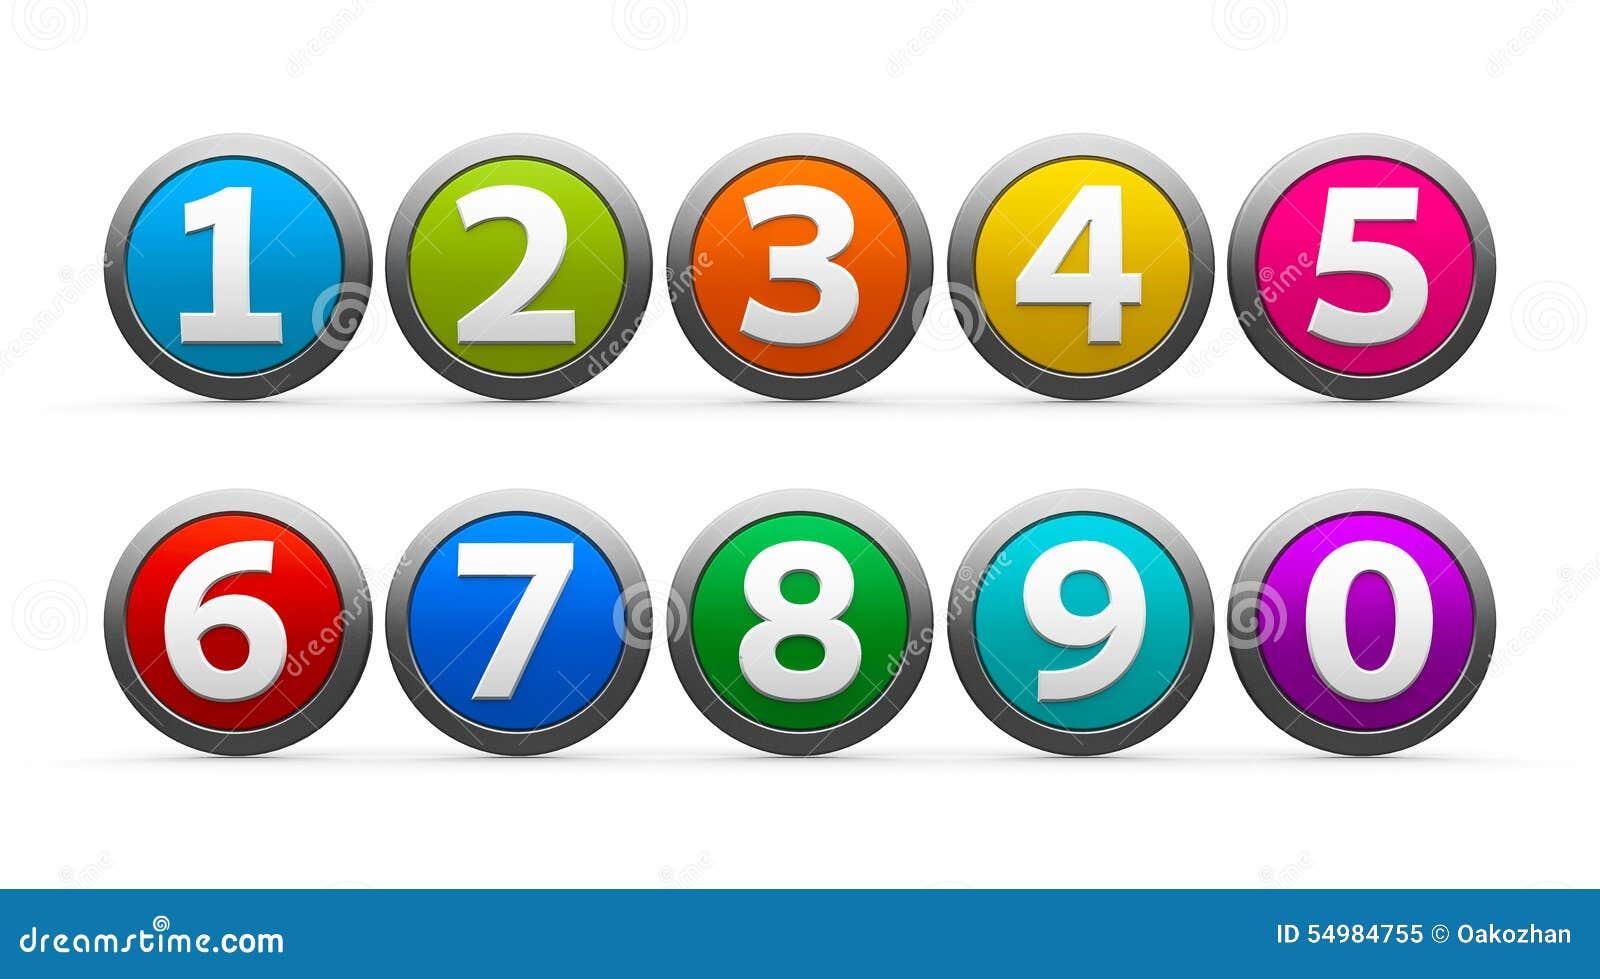 Картинки цифр для кнопок